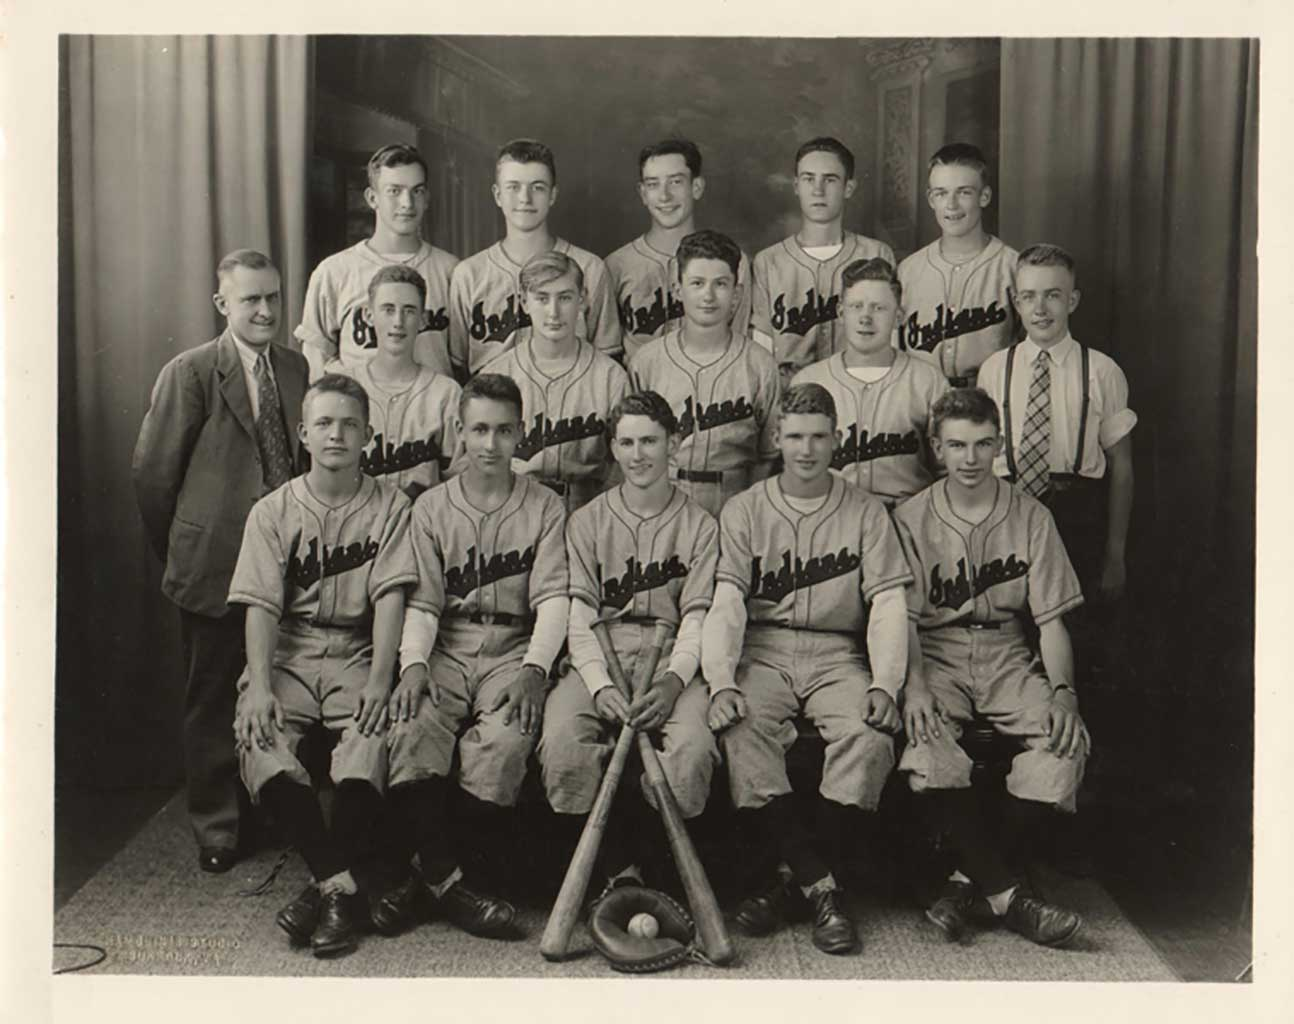 chuckatuck-baseball-team-1945-img228